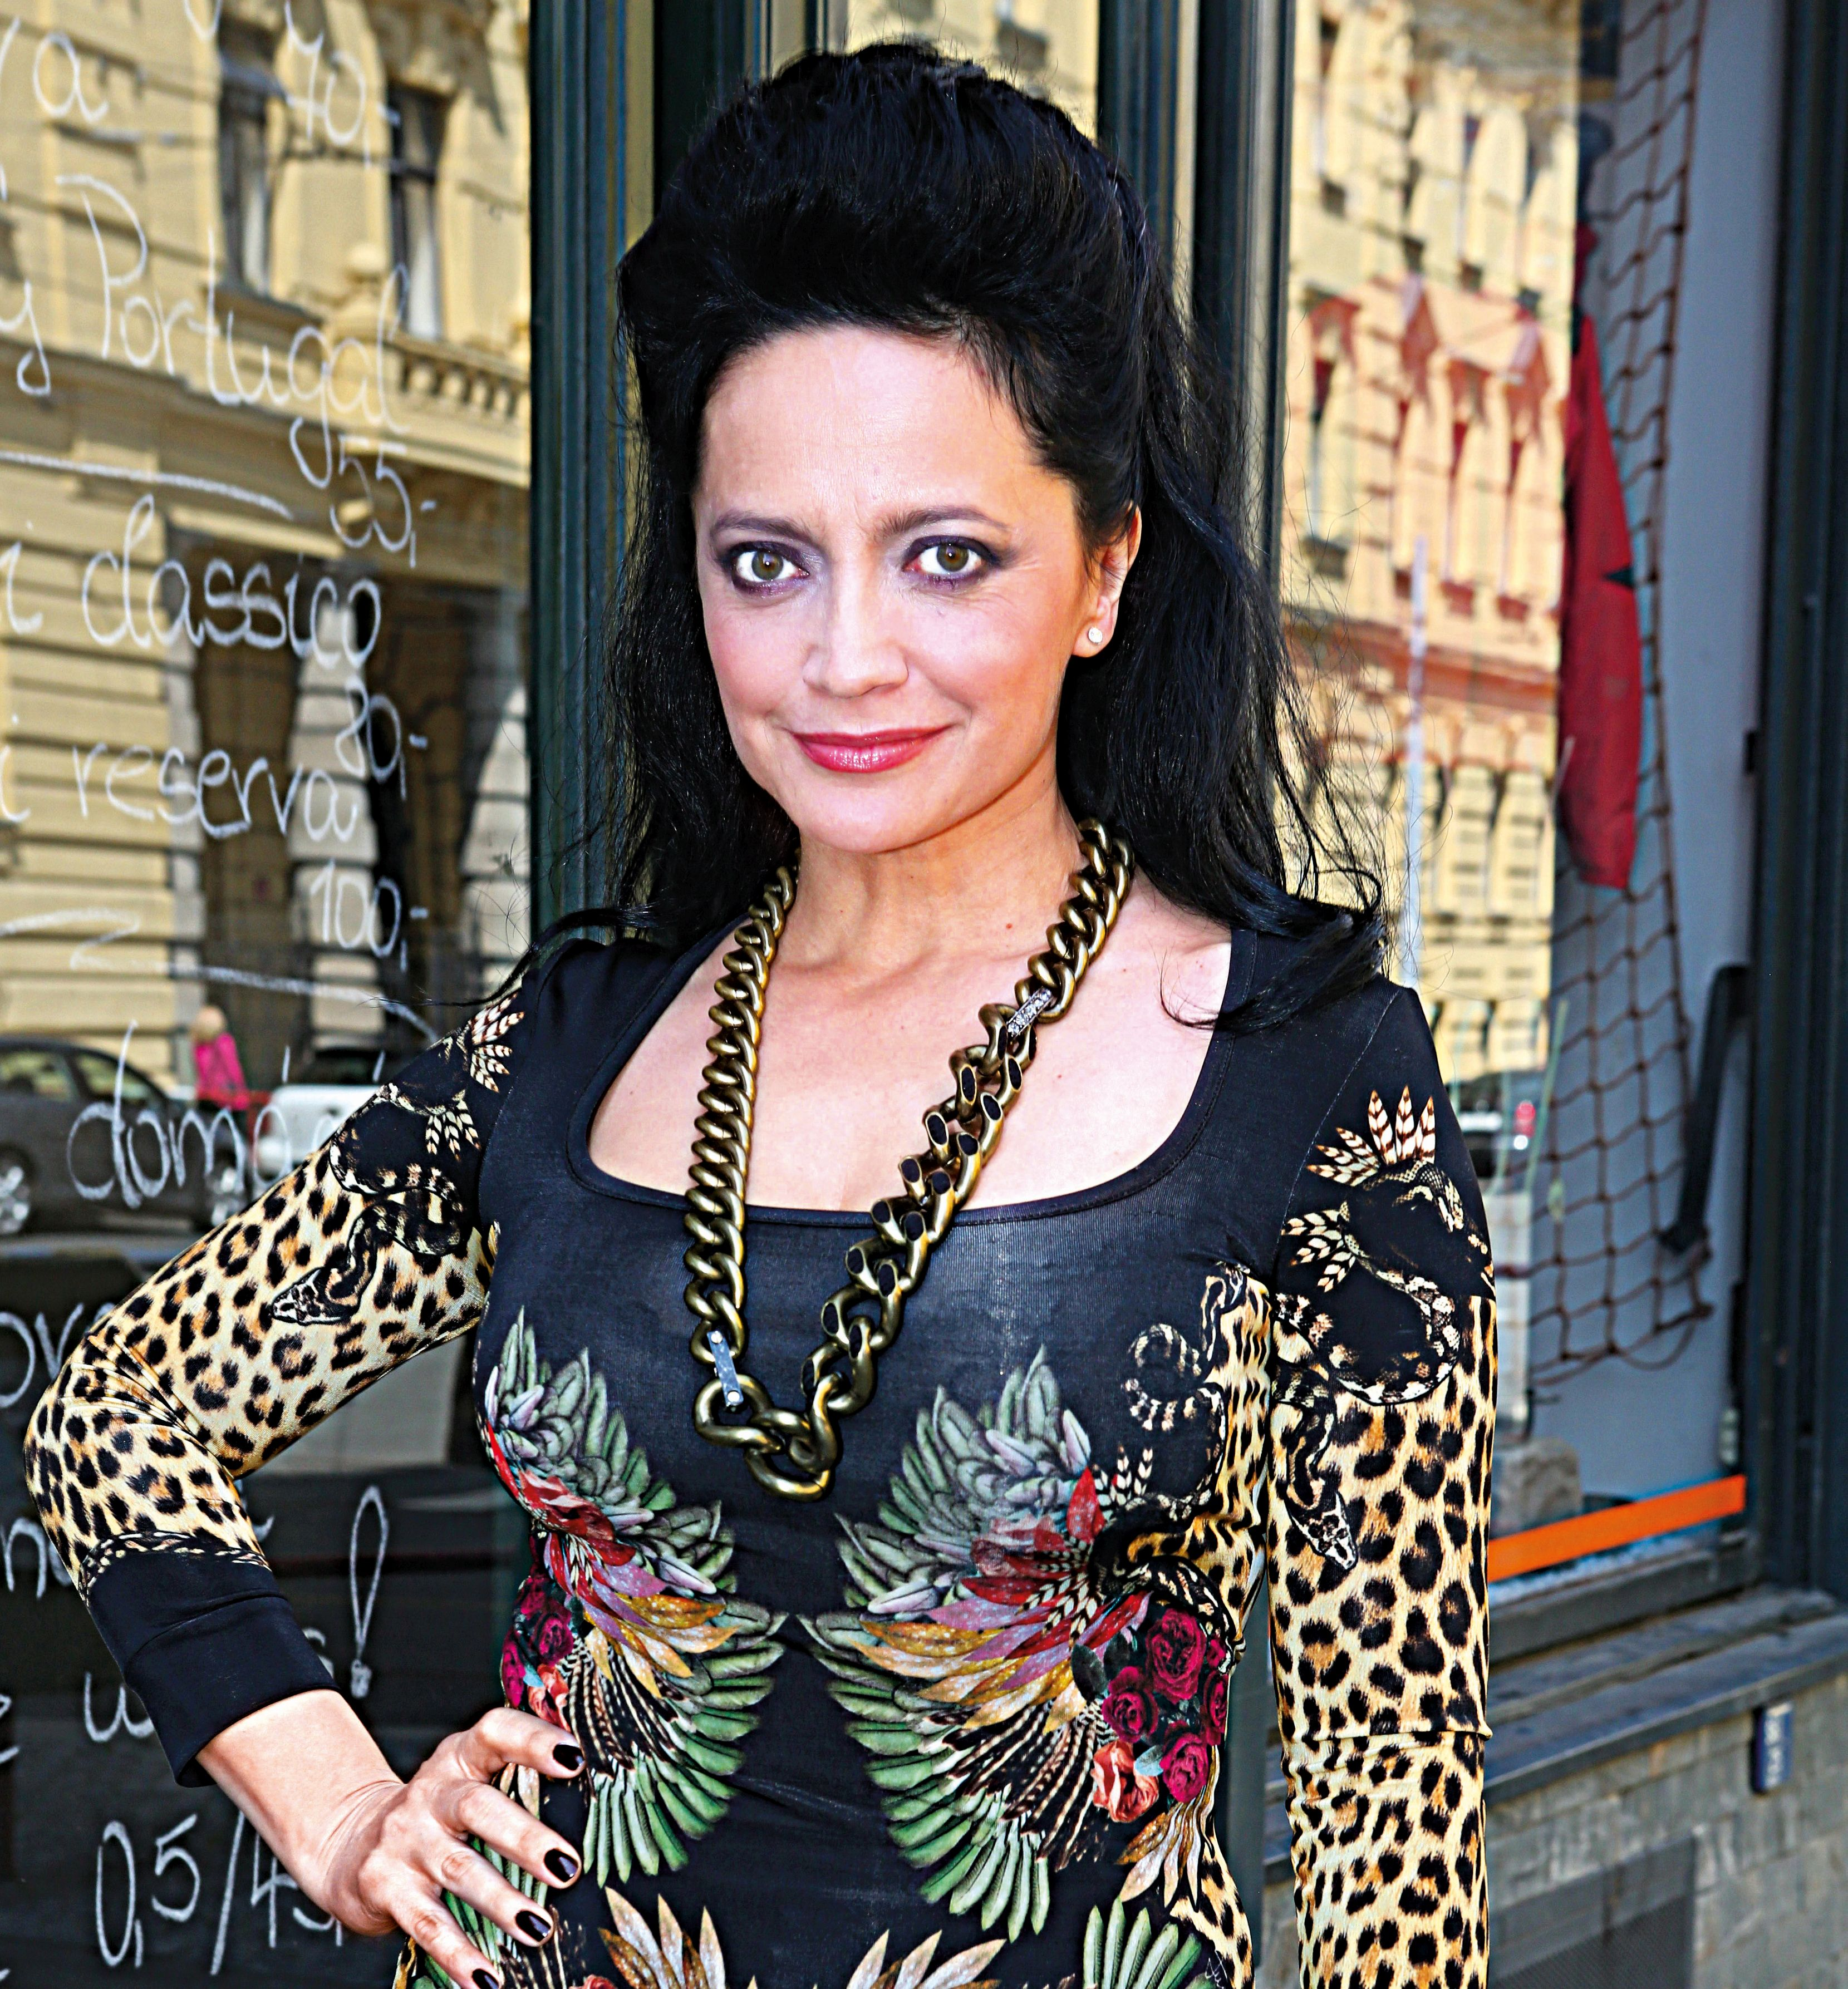 Krest CD Amoroso muzikaloveho zpevaka Radima Schwaba.